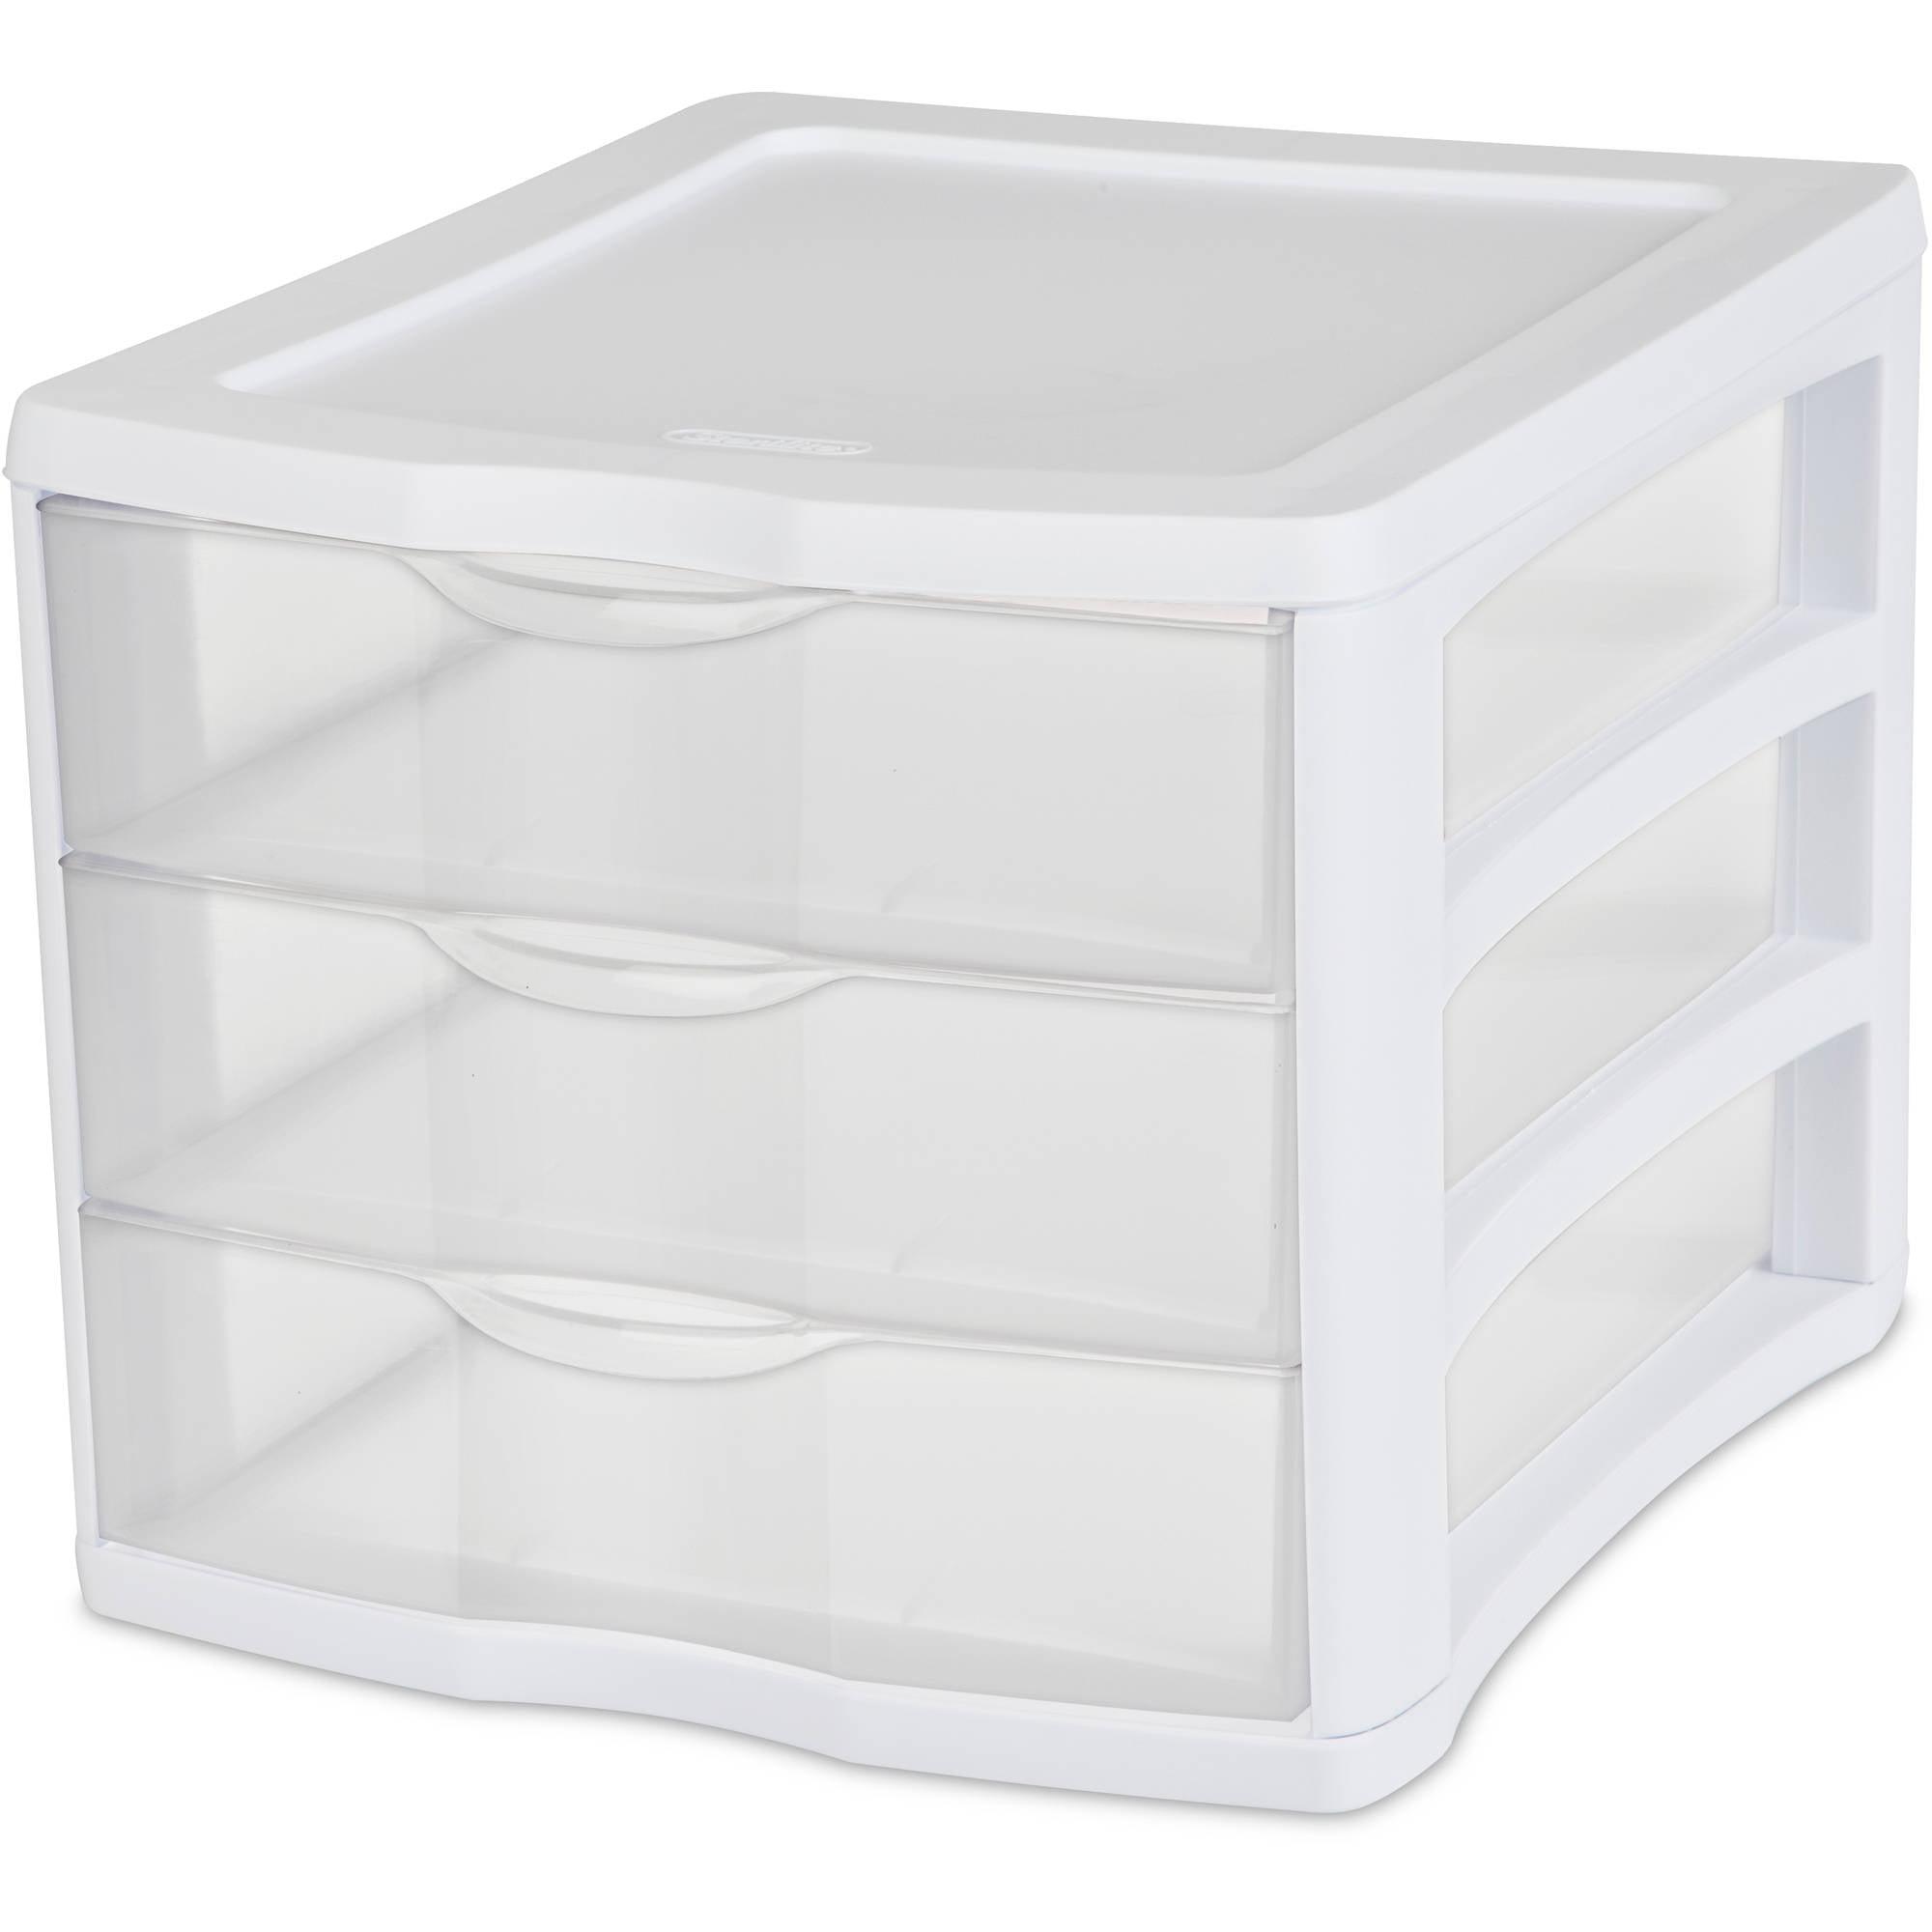 Sterilite 3-Drawer Organizer, White